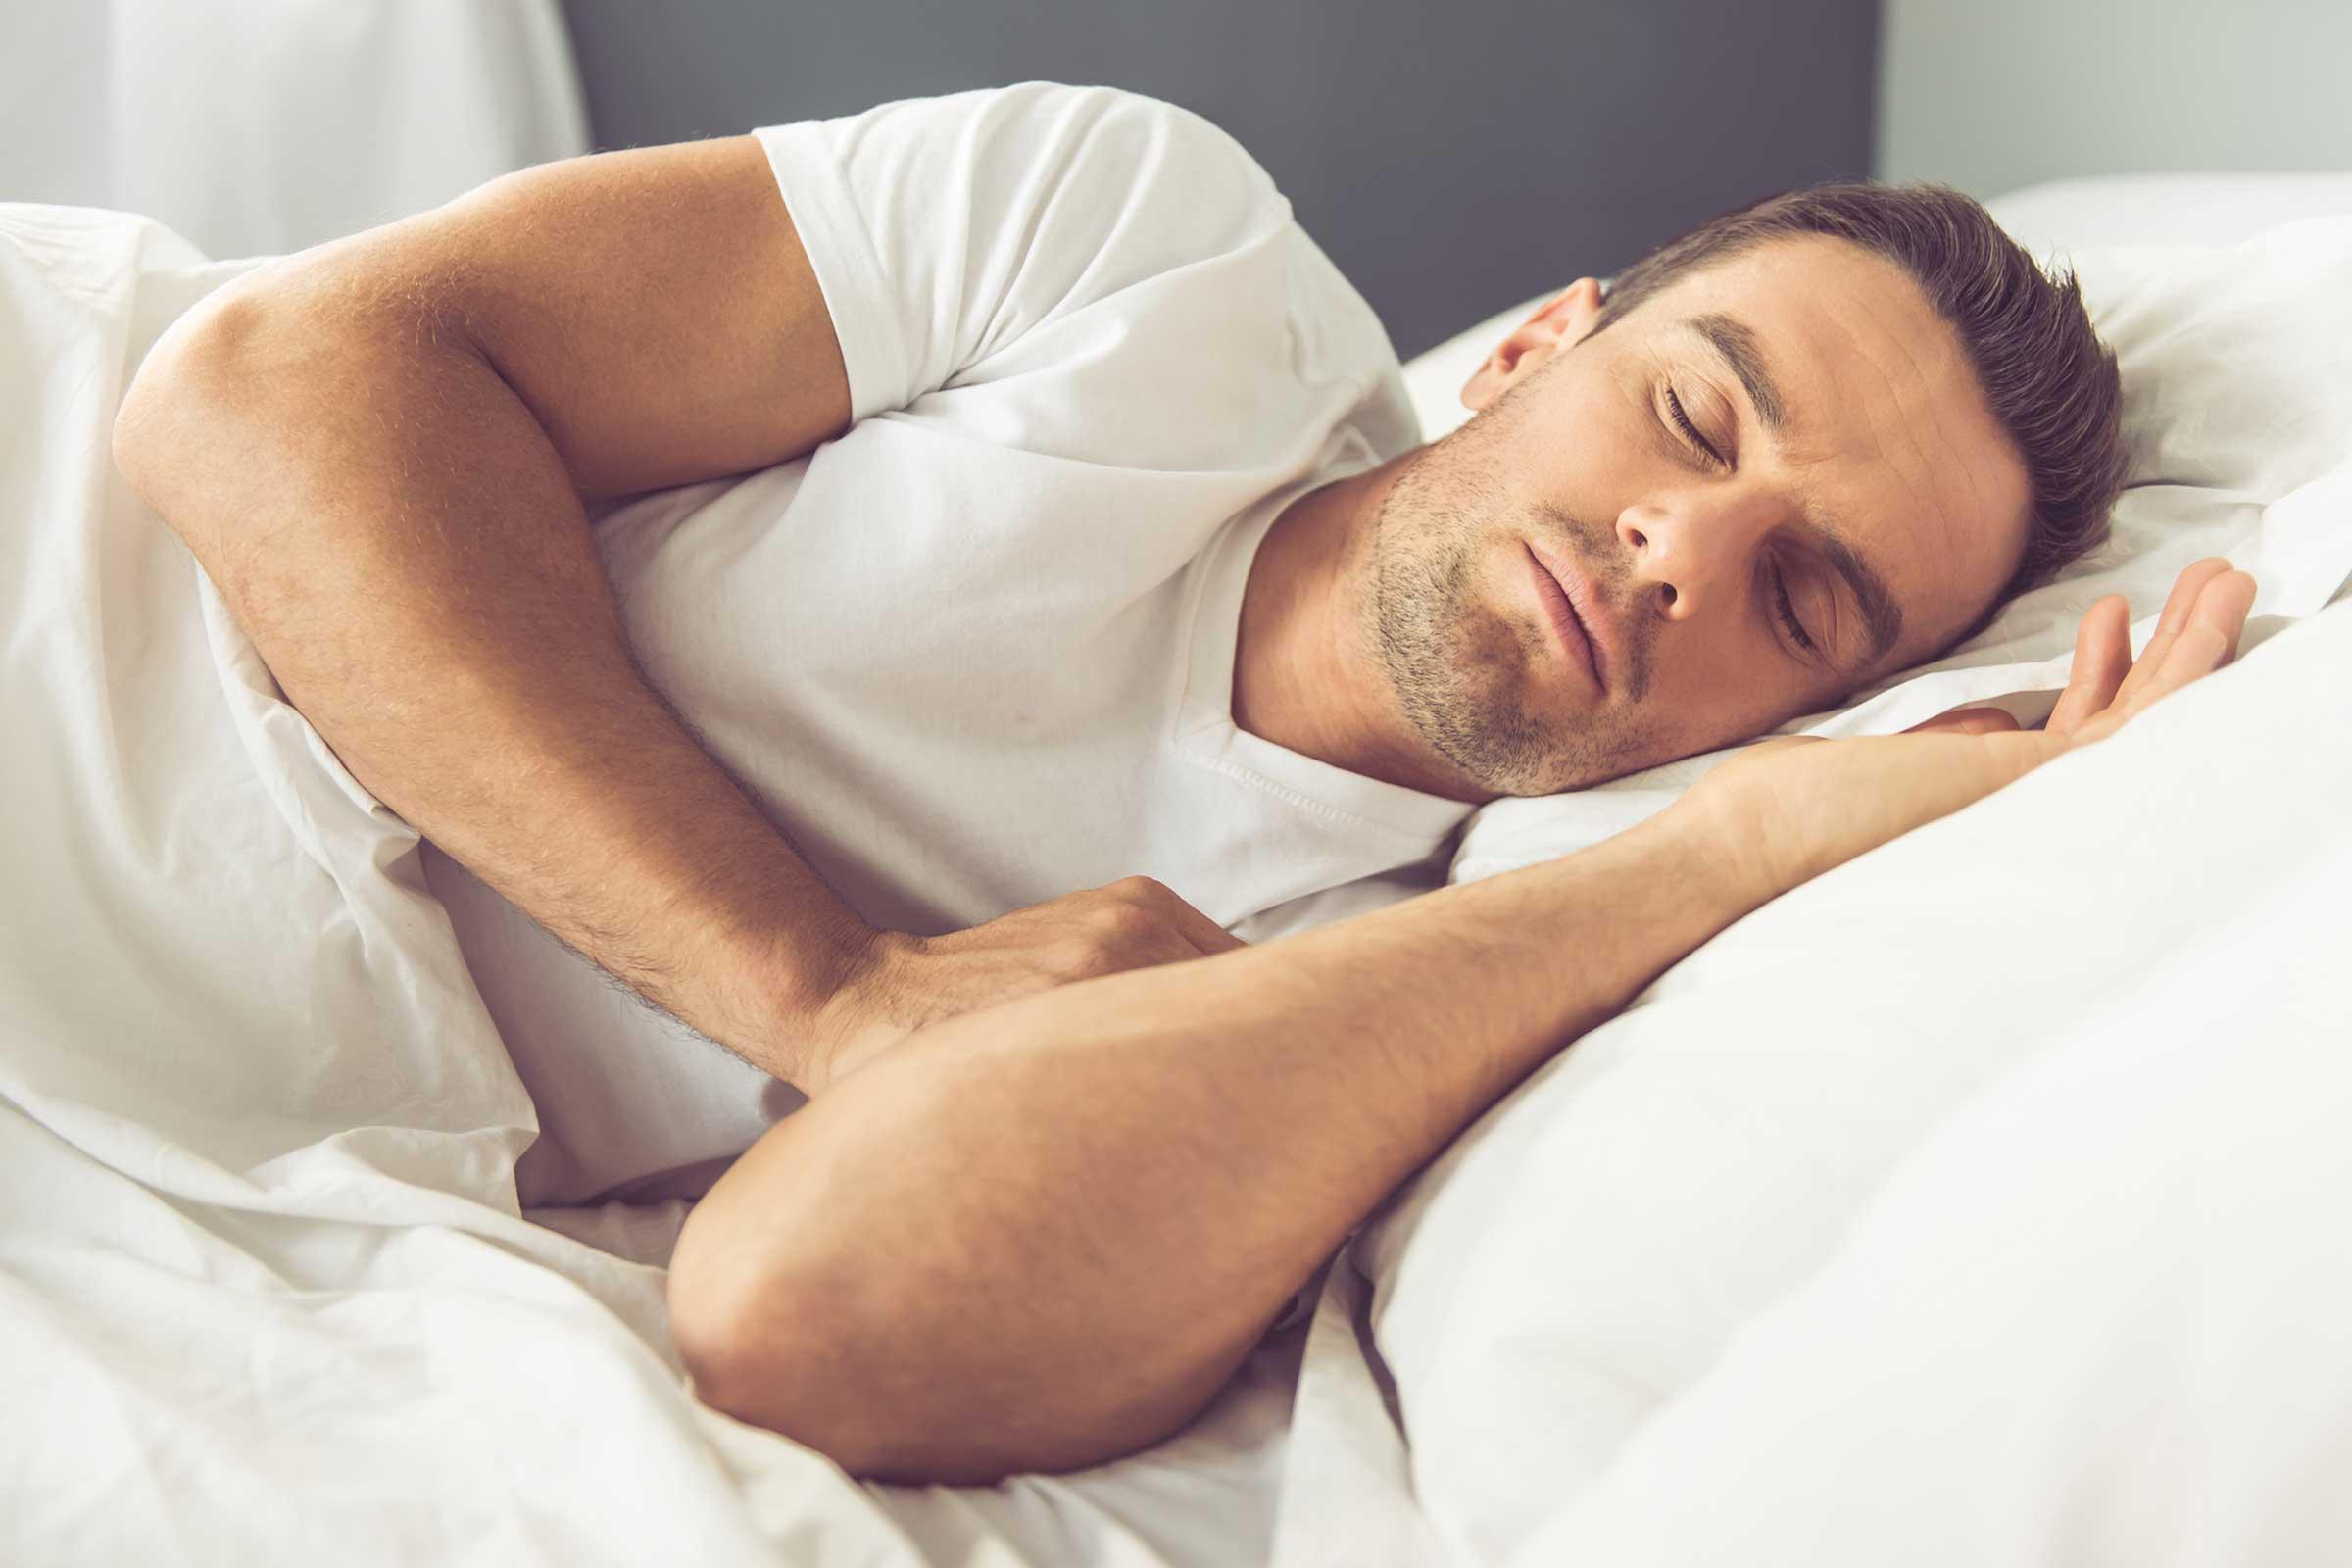 things-that-can-happen-sleep-paralysis-599958190-vadimguzhva.jpg